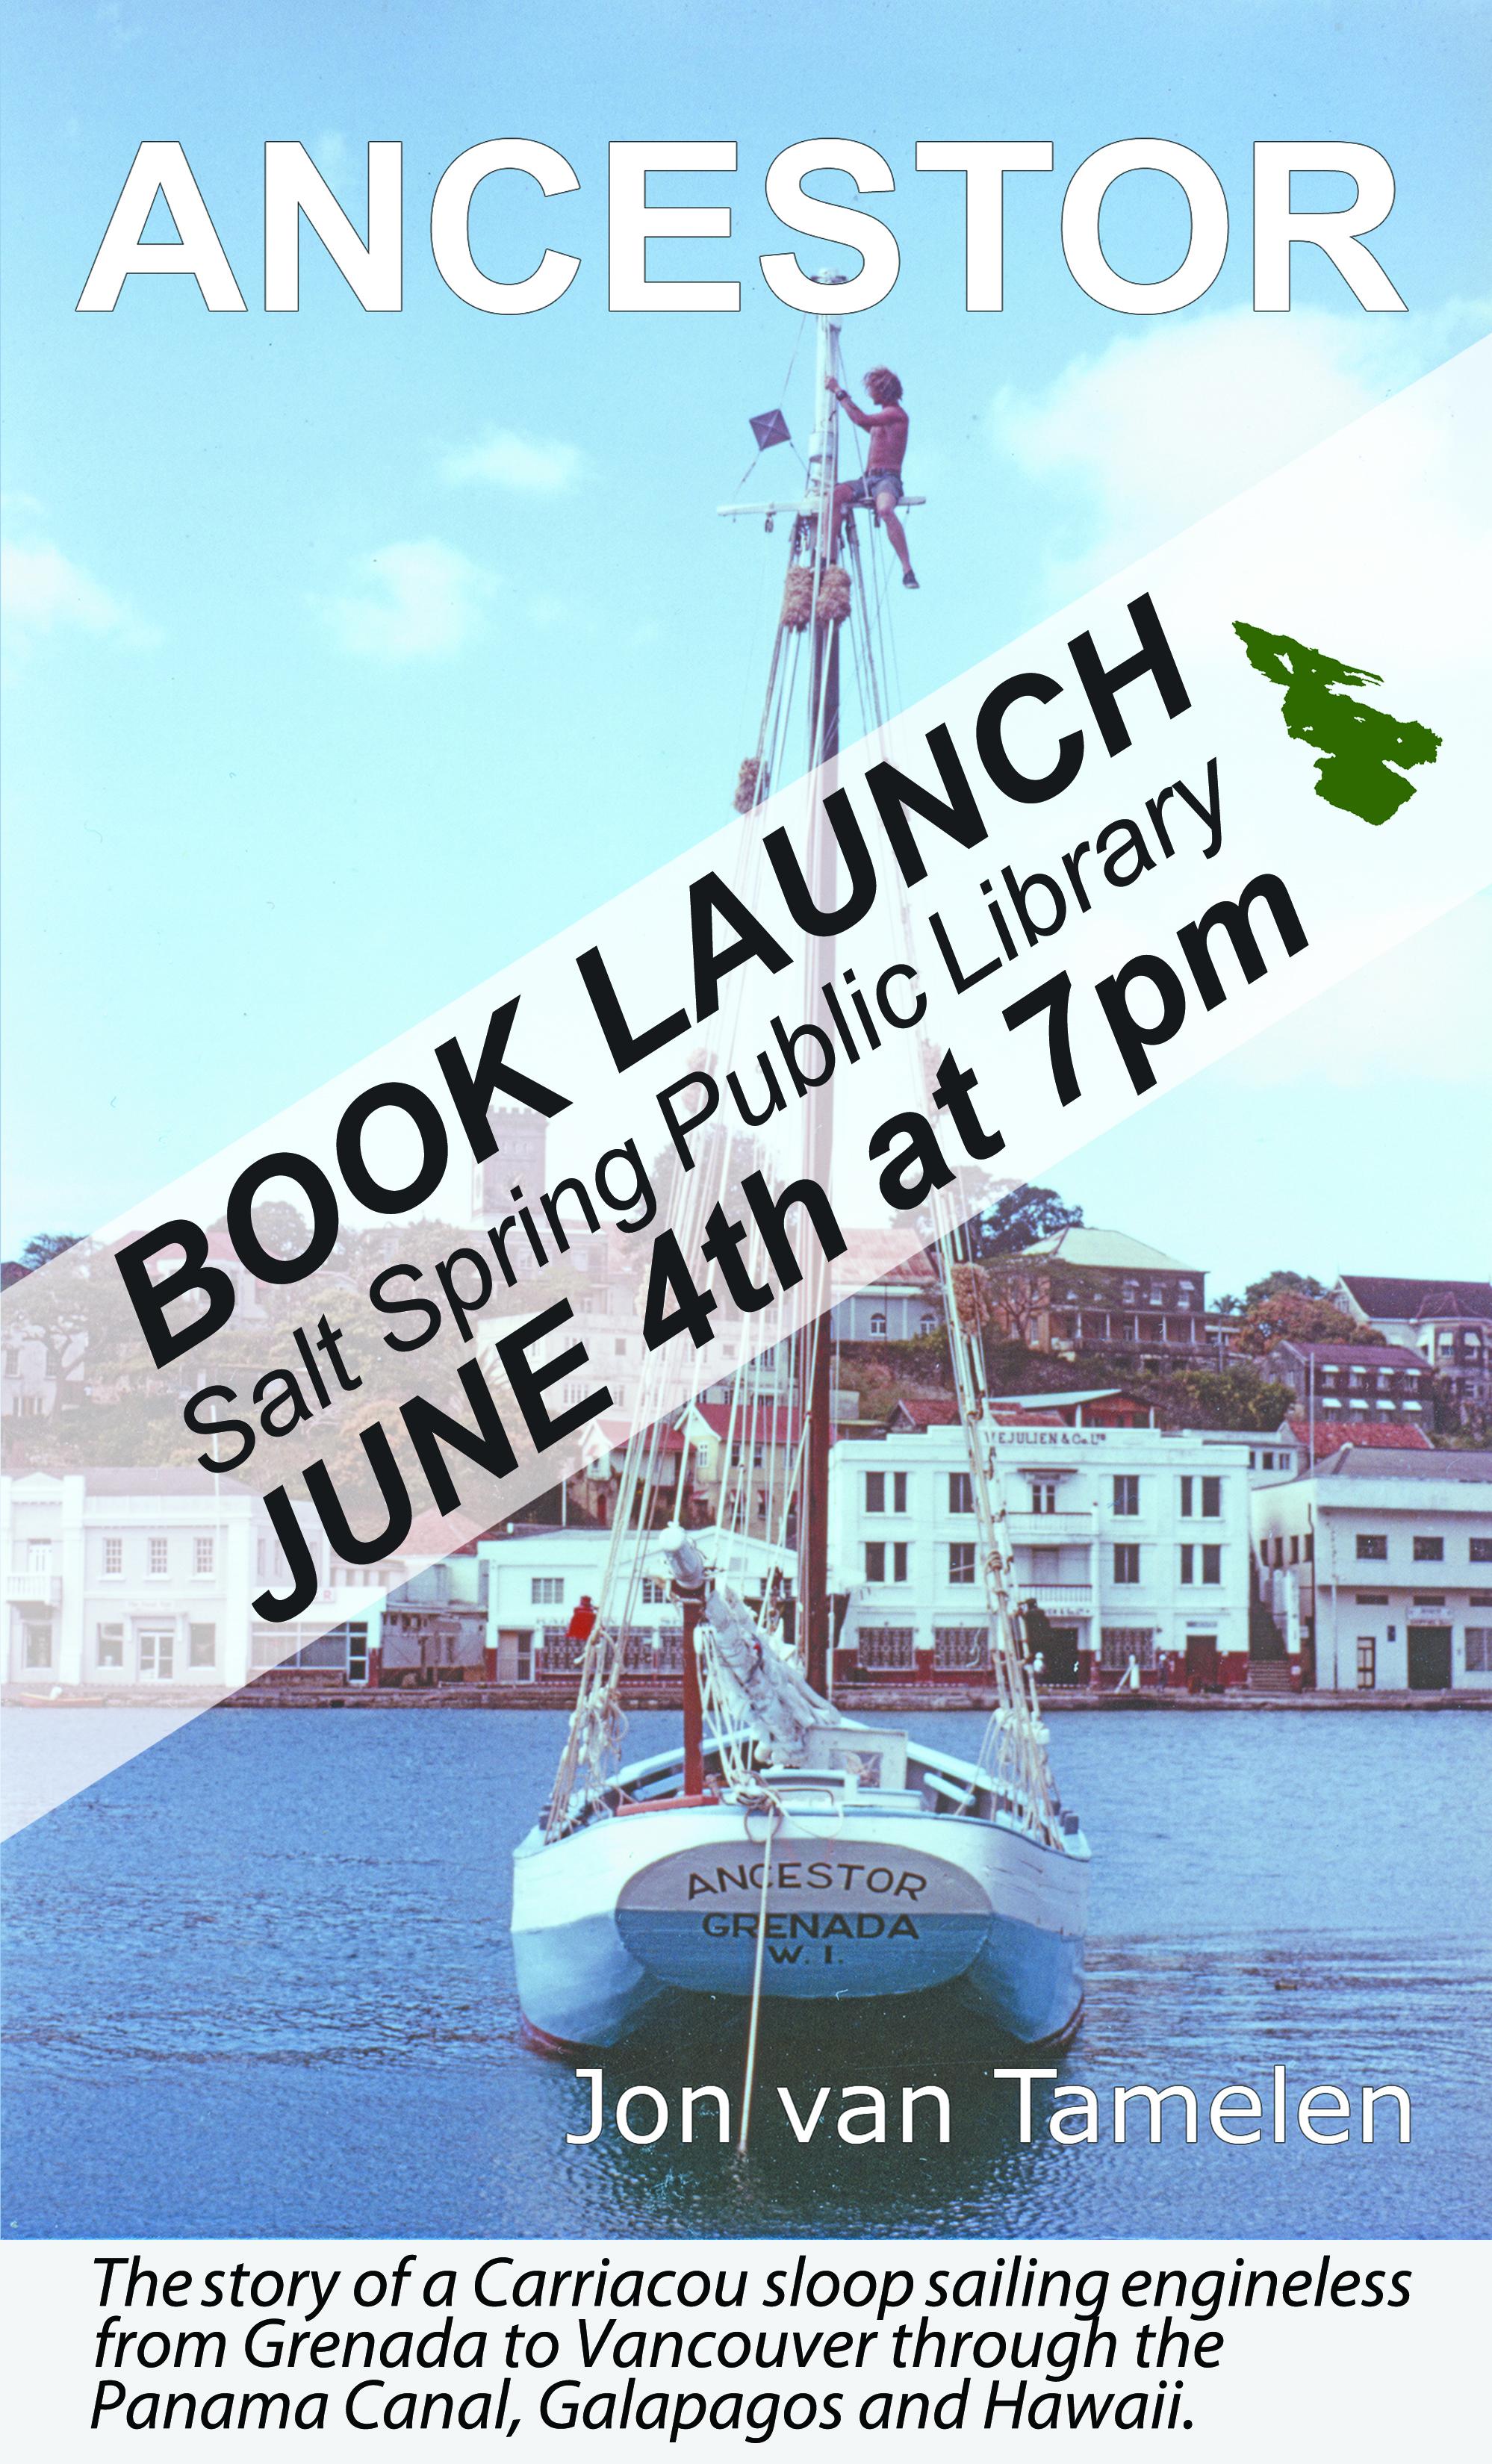 Book Launch:  Jon van Tamelen - The Ancestor @ Community Program Room